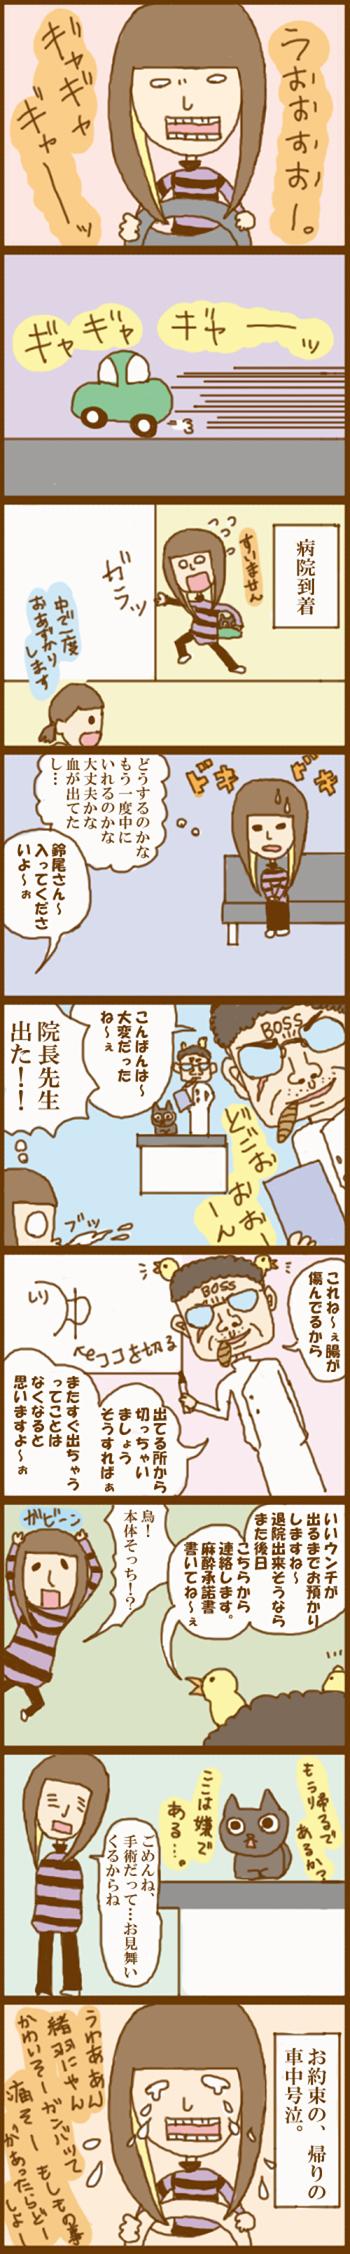 f:id:suzuokayu:20201110094602j:plain